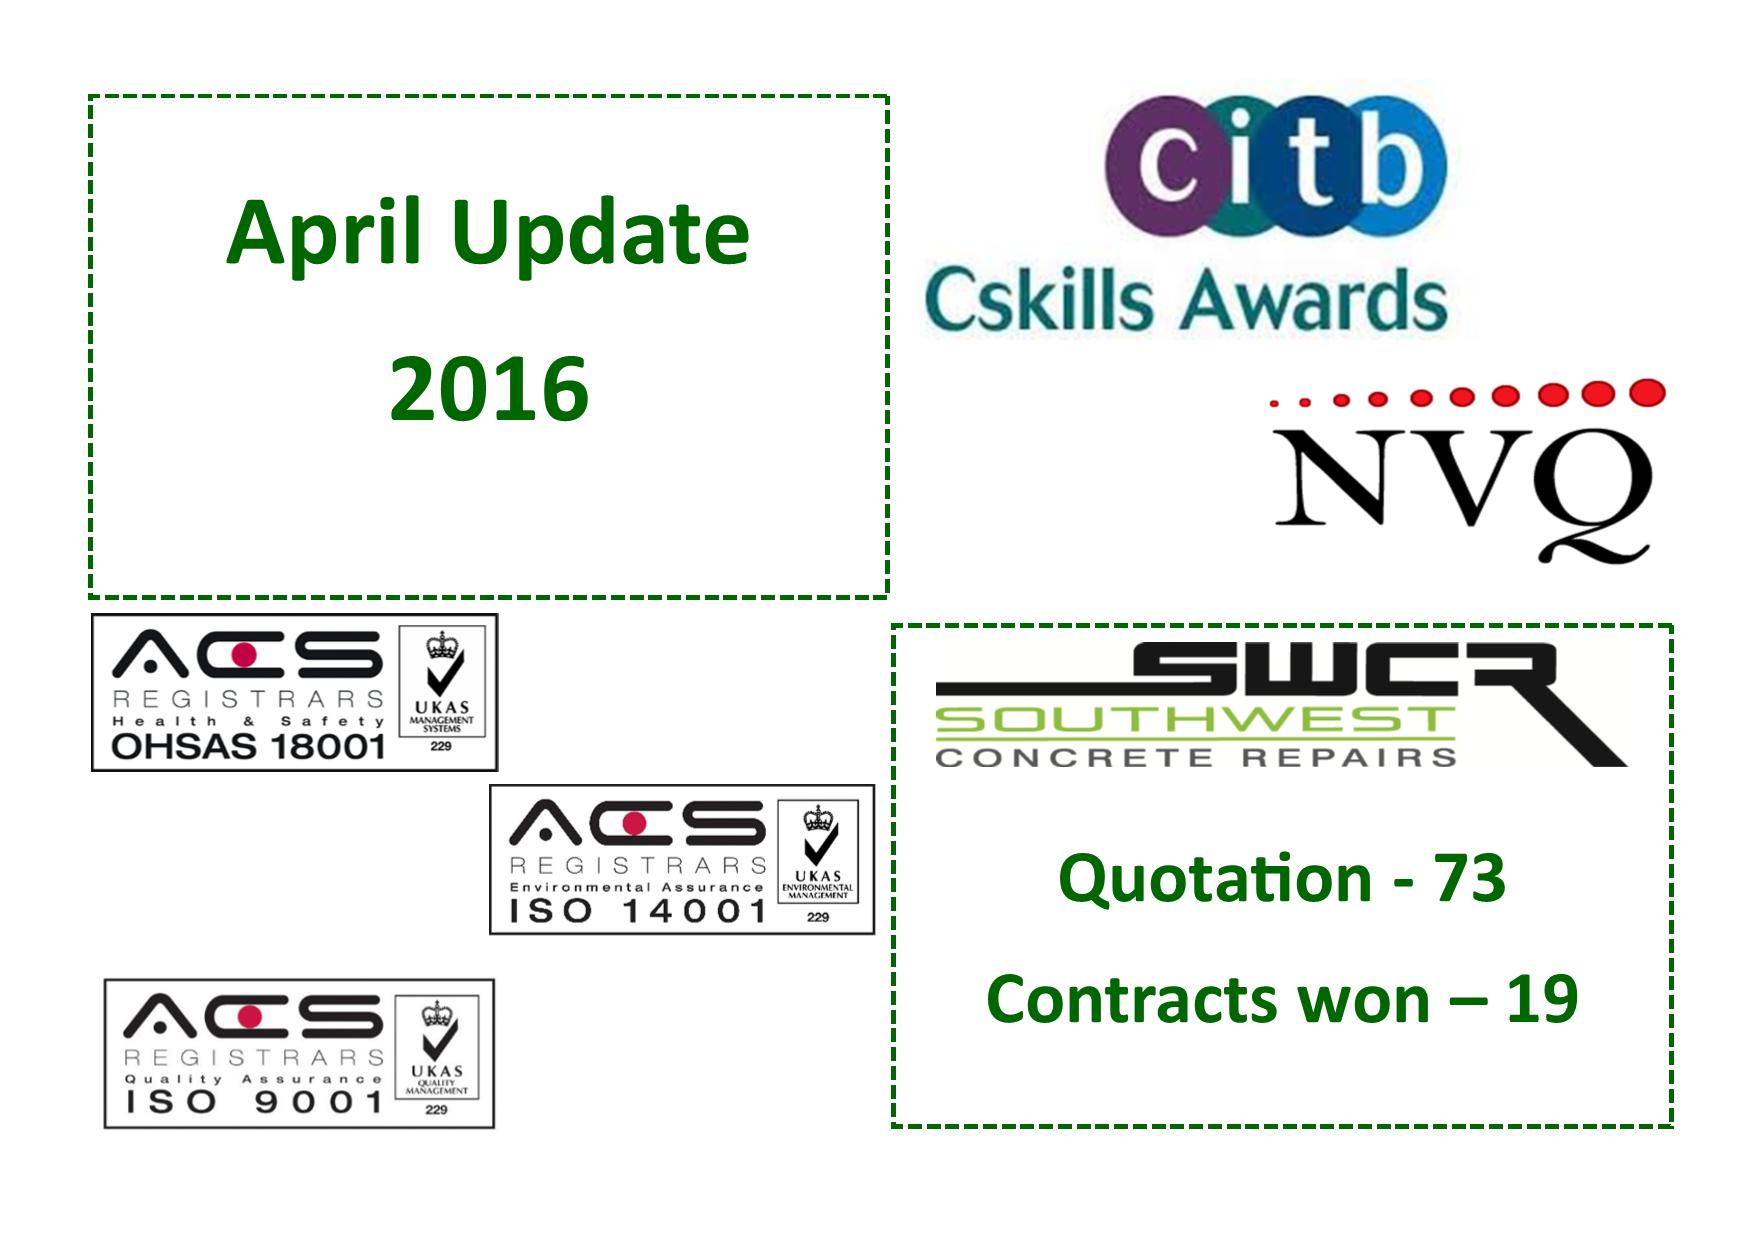 April update graphic